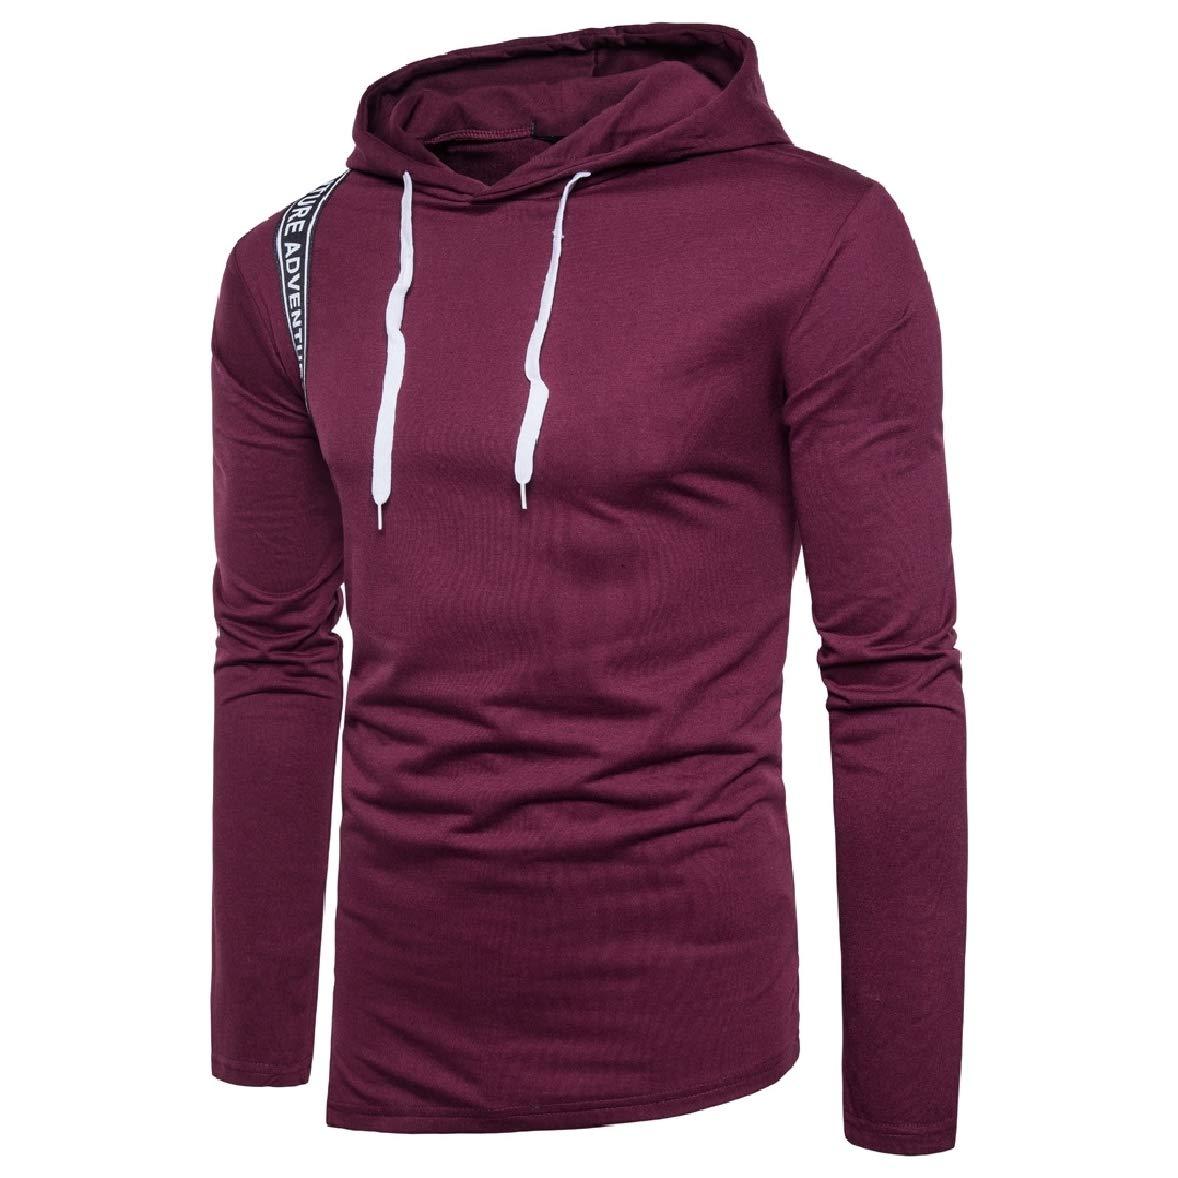 Zimaes-Men Pullover Hood Letter Printed Oversize Outwear Sweatshirt